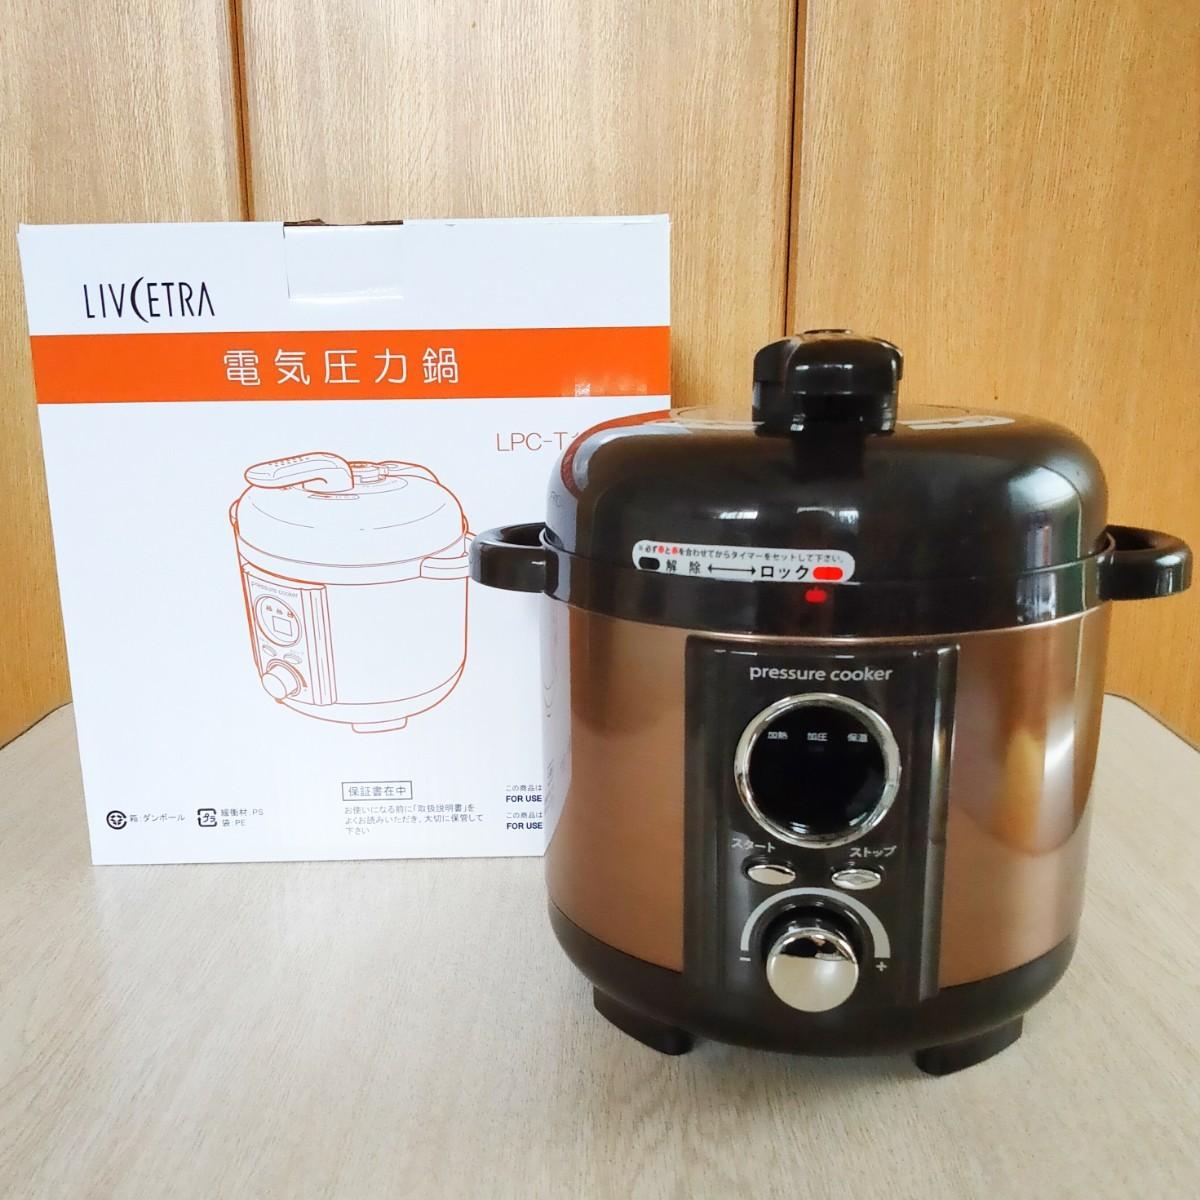 LIVCETRA ( リブセトラ ) ほったらかし ミニ電気圧力鍋 電気圧力鍋 LPC-T12W/T  圧力鍋 家庭用